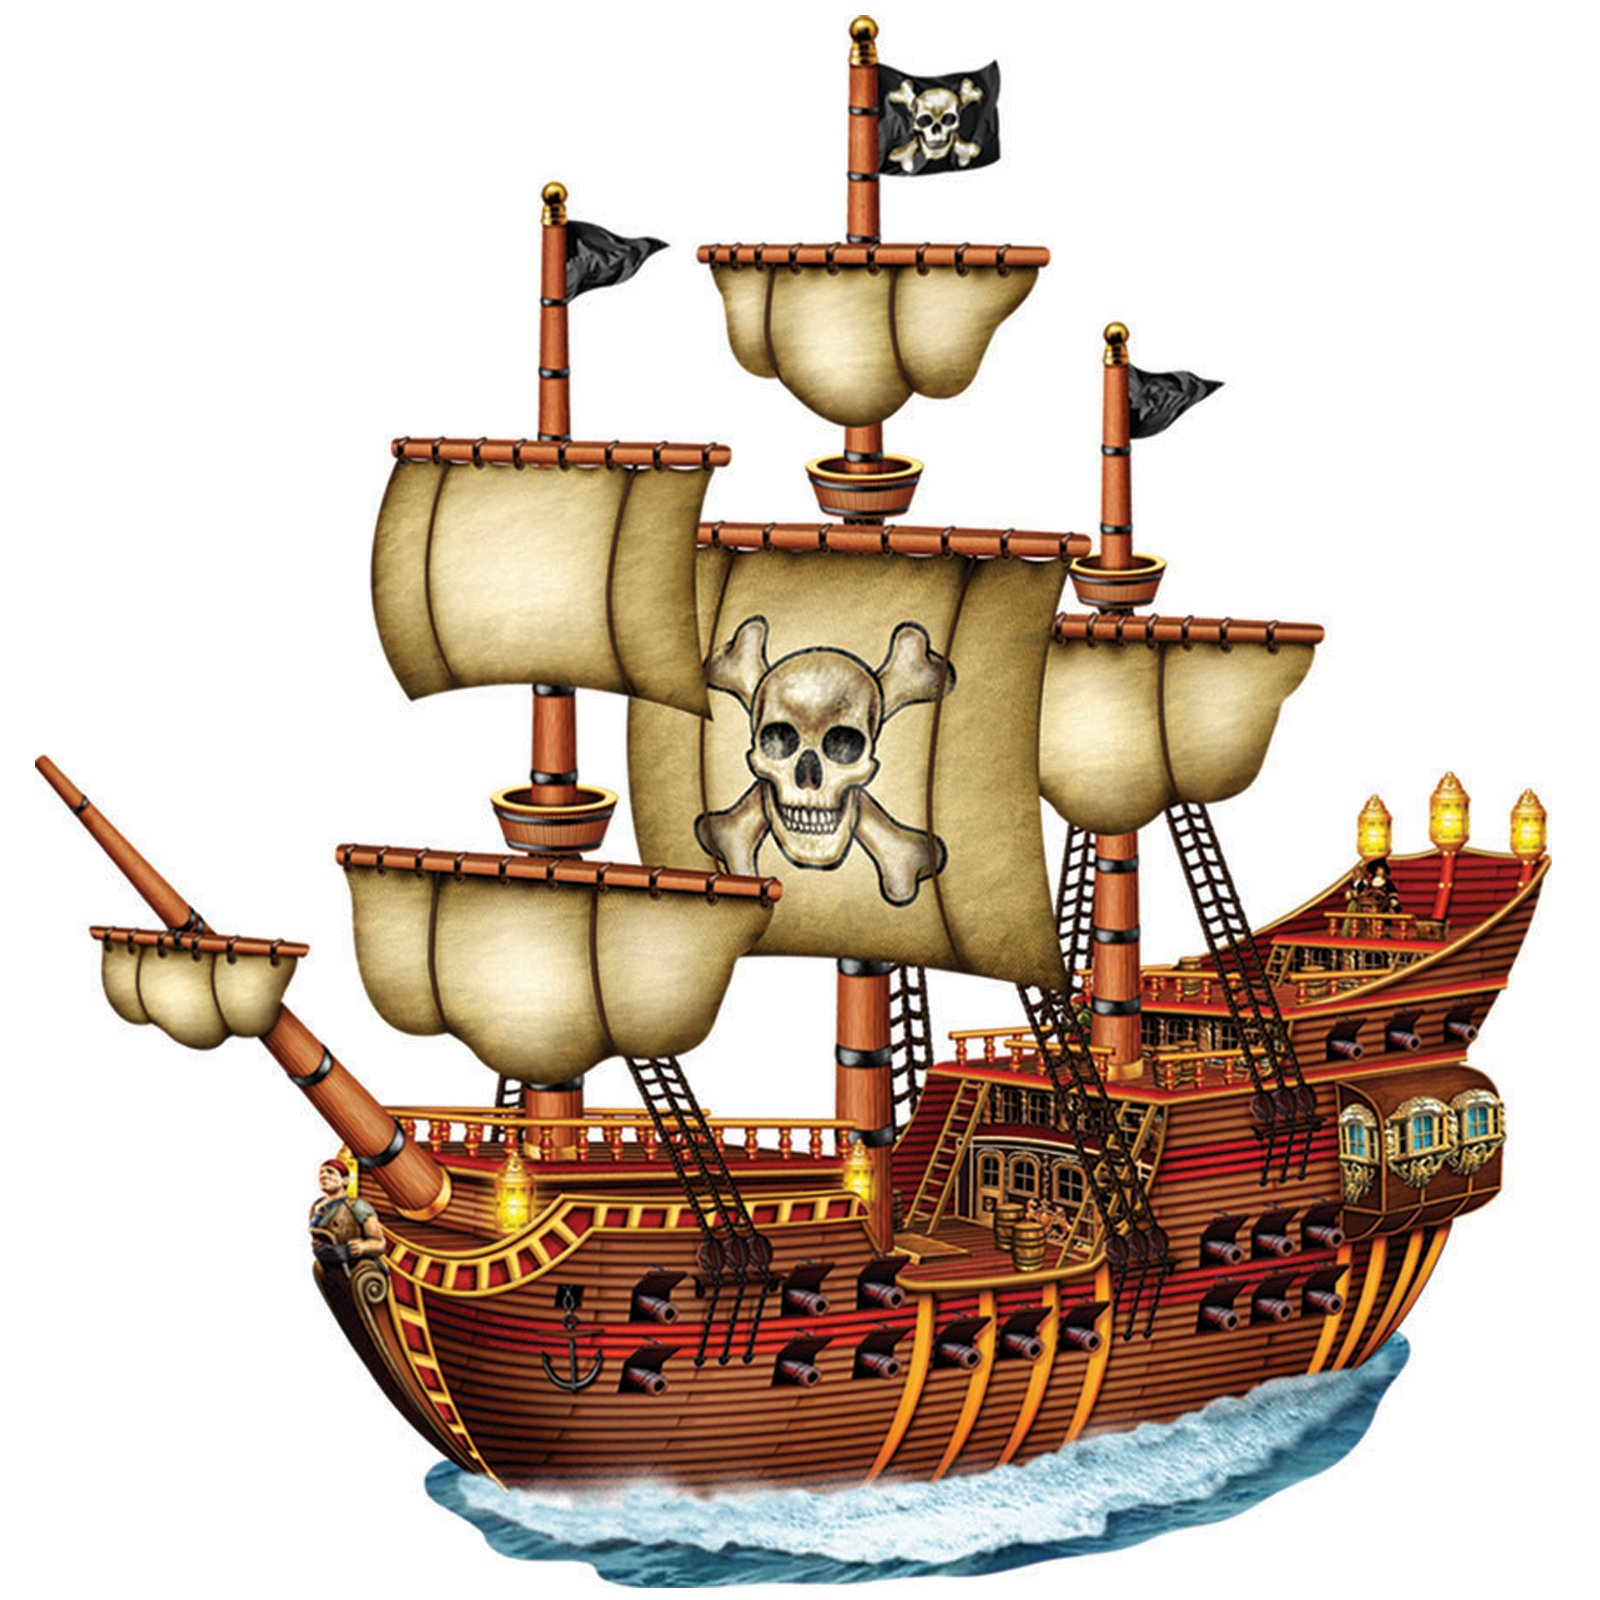 1600x1600 Pirate Ship Clipart